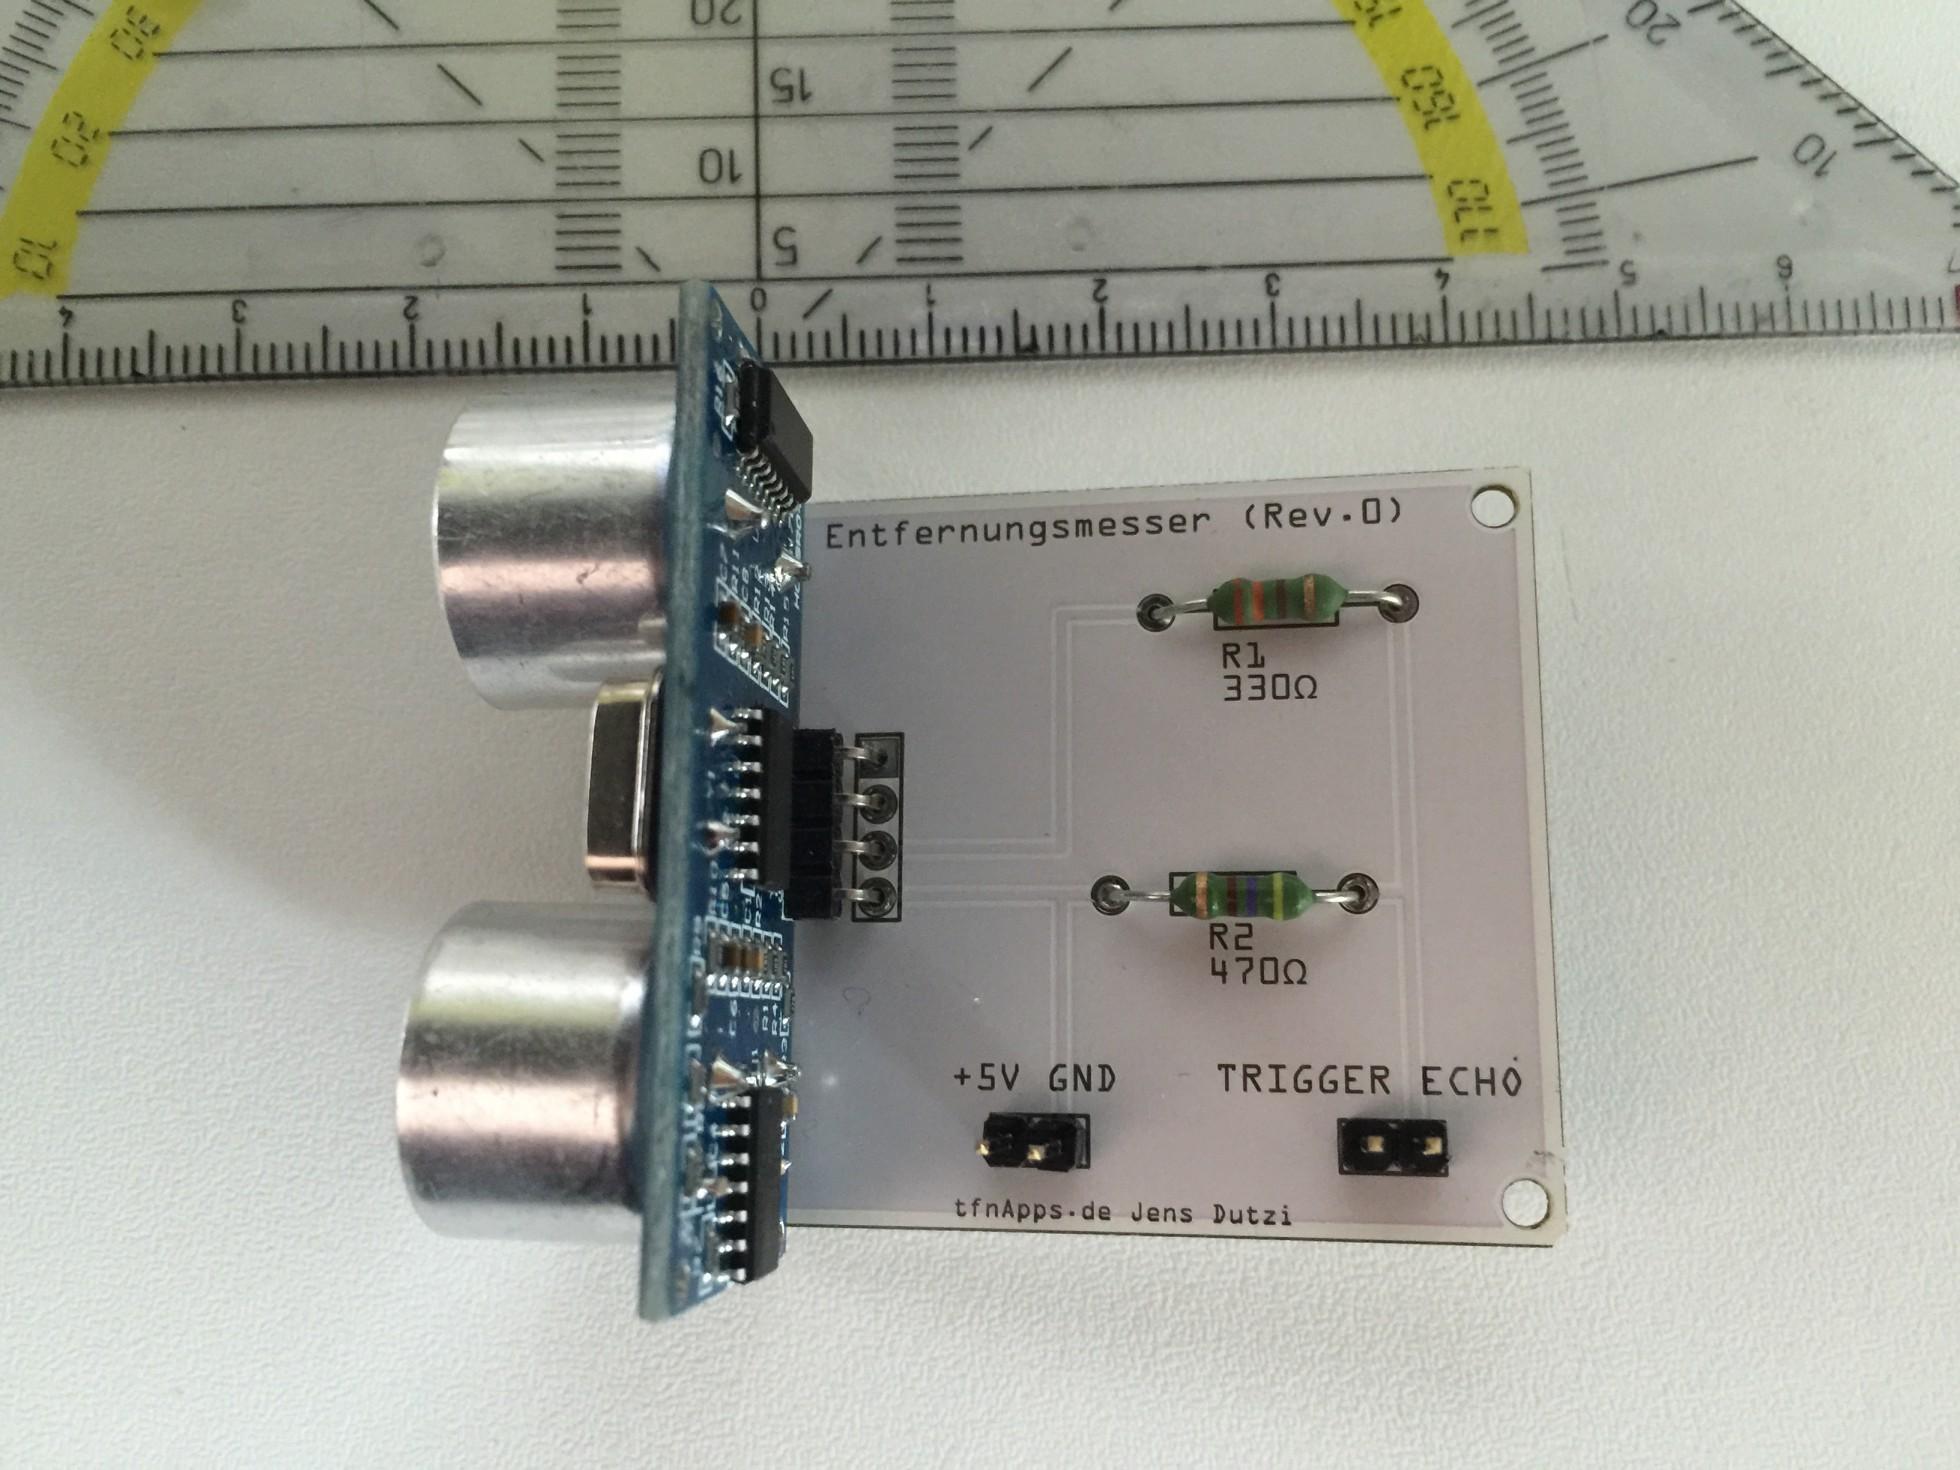 Raspberry-Pi Basteprojekt #1: Entfernungsmesser